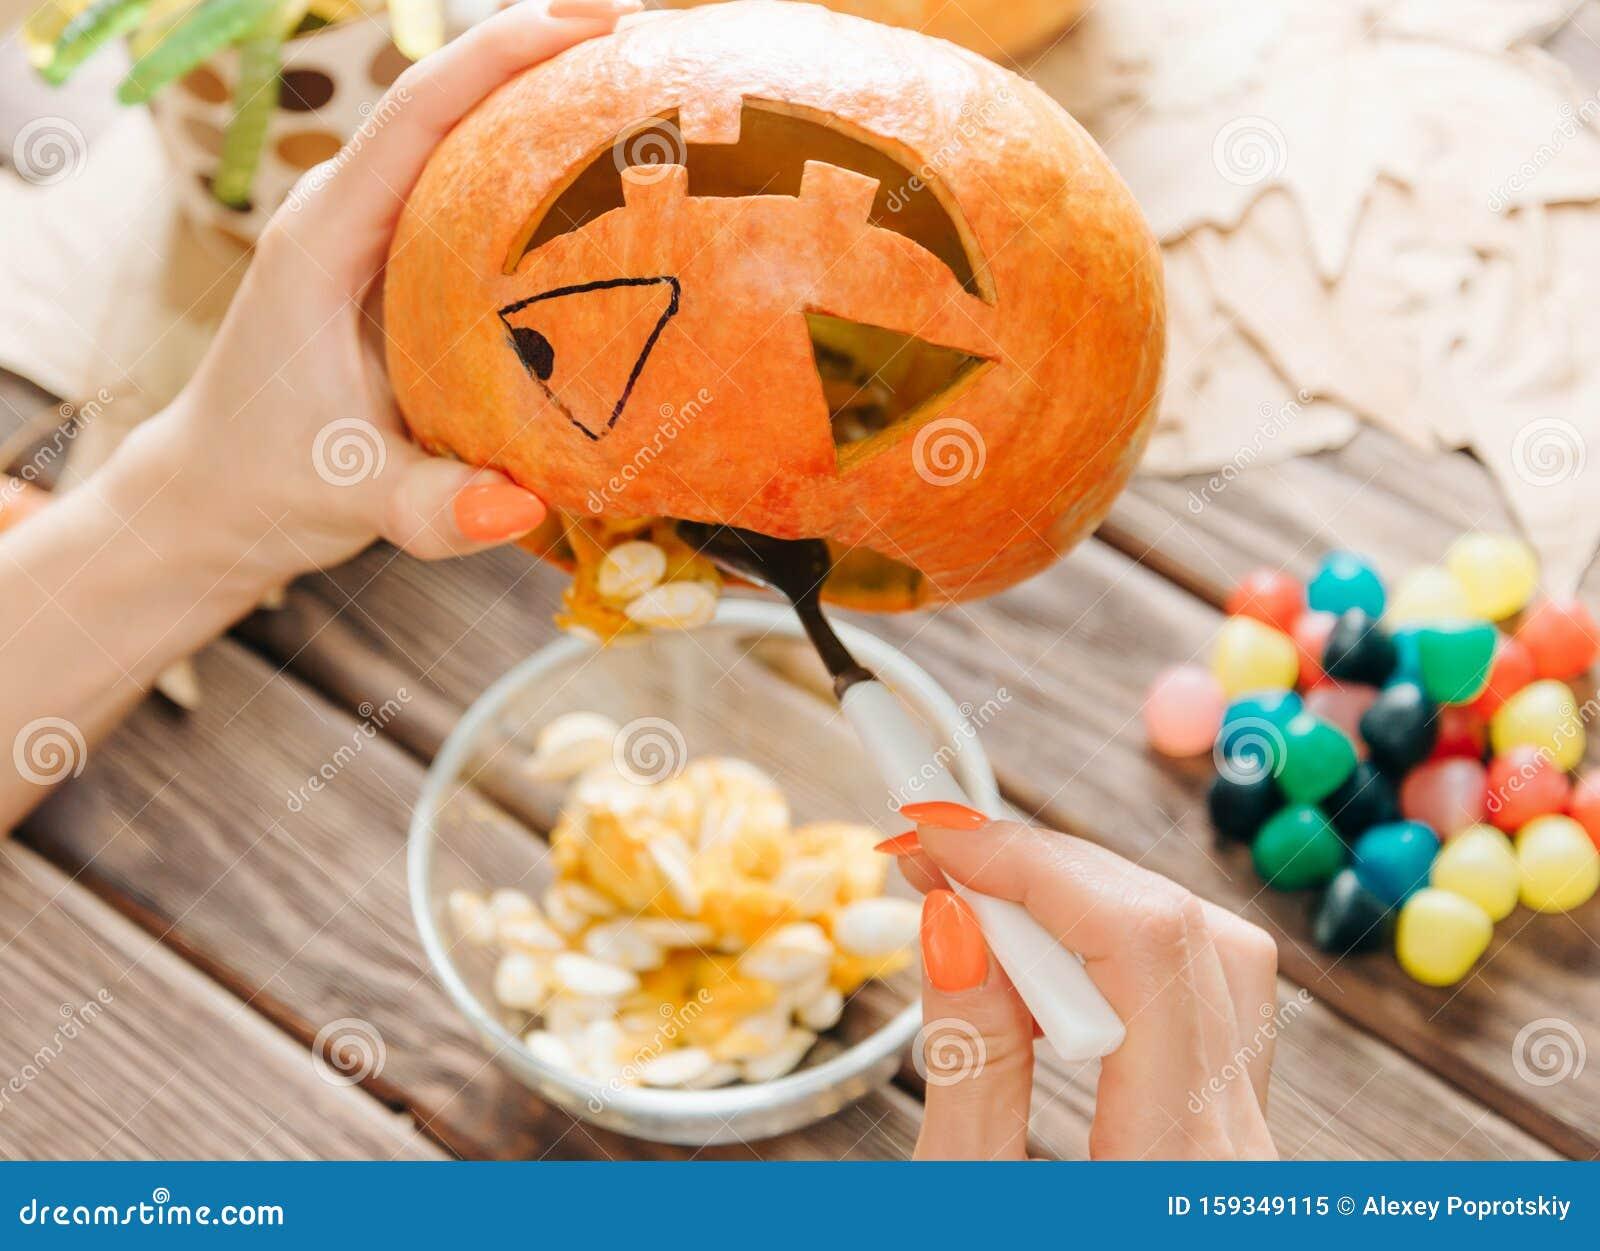 Female hands preparing jack-o-lantern pumpkin for Halloween.